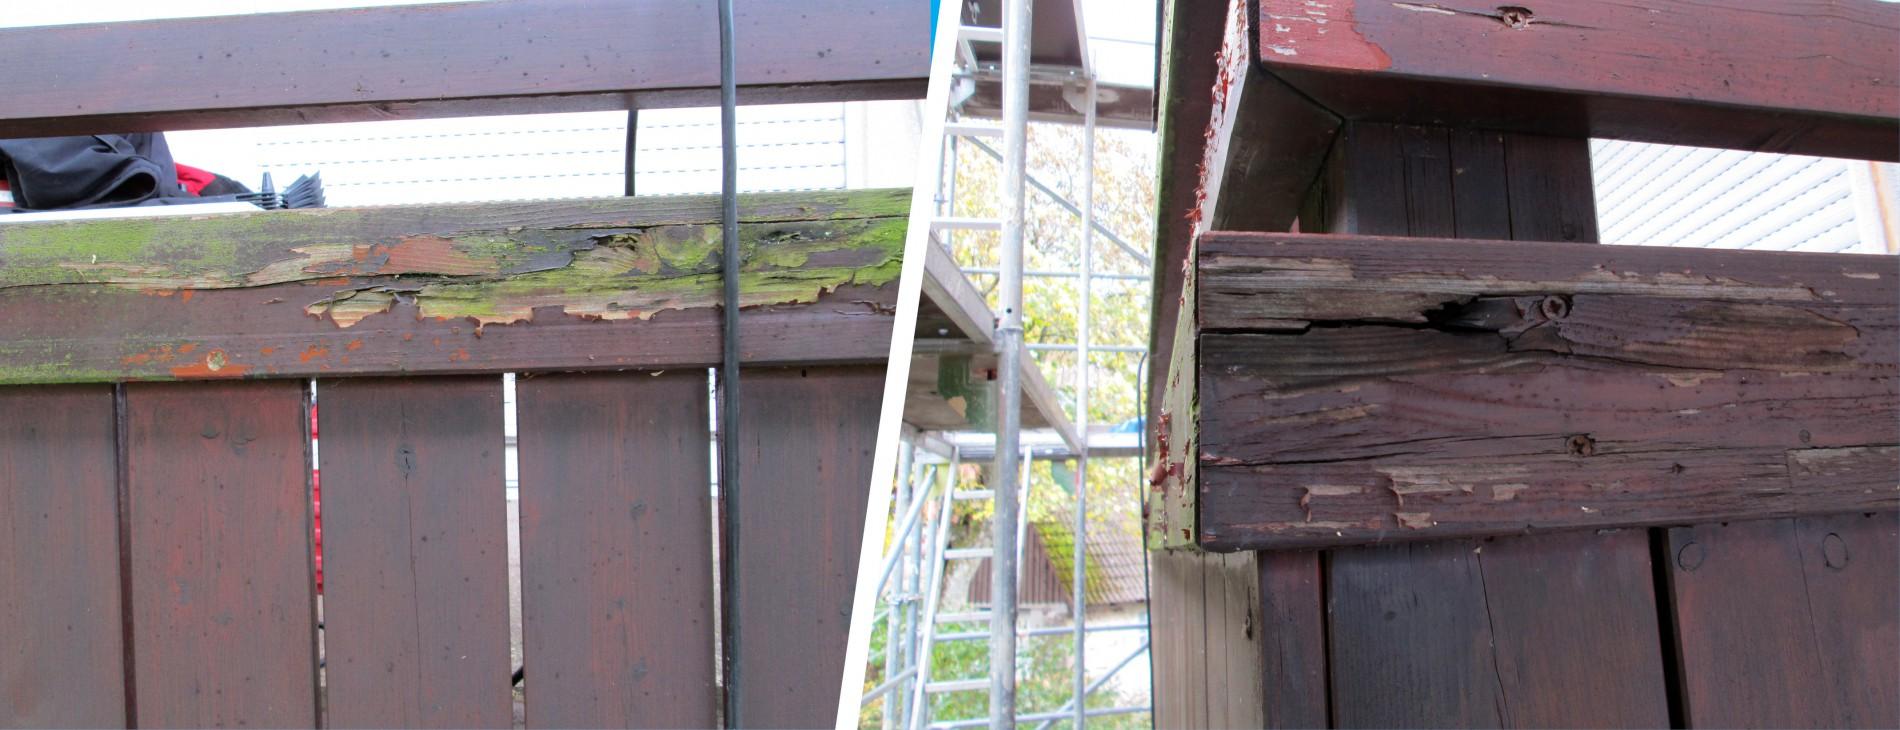 Balkon-Sanierung05